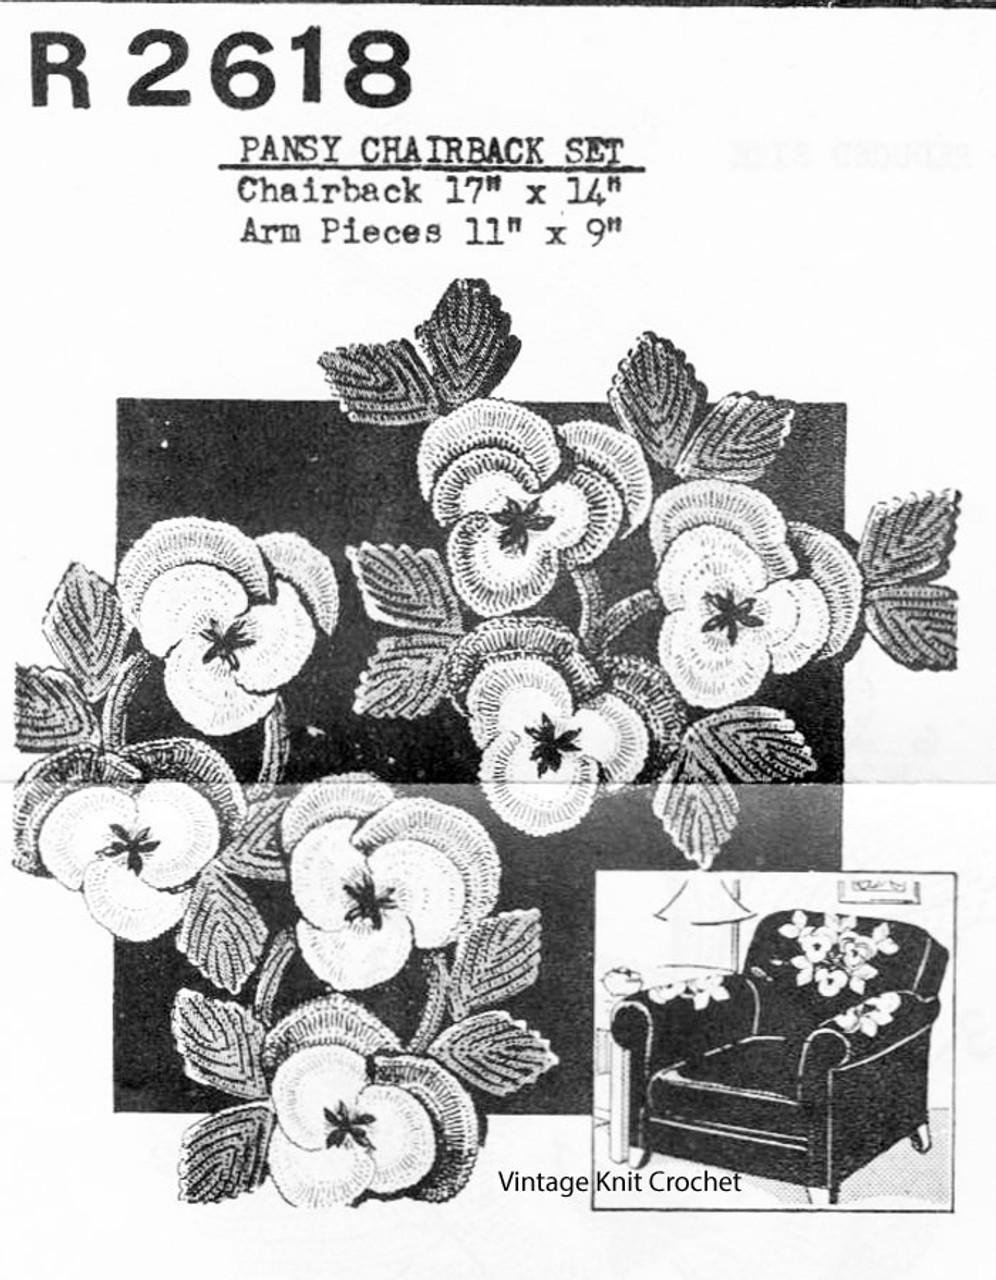 Vintage Crochet pansy Doily Pattern, Chair Set No R-2618